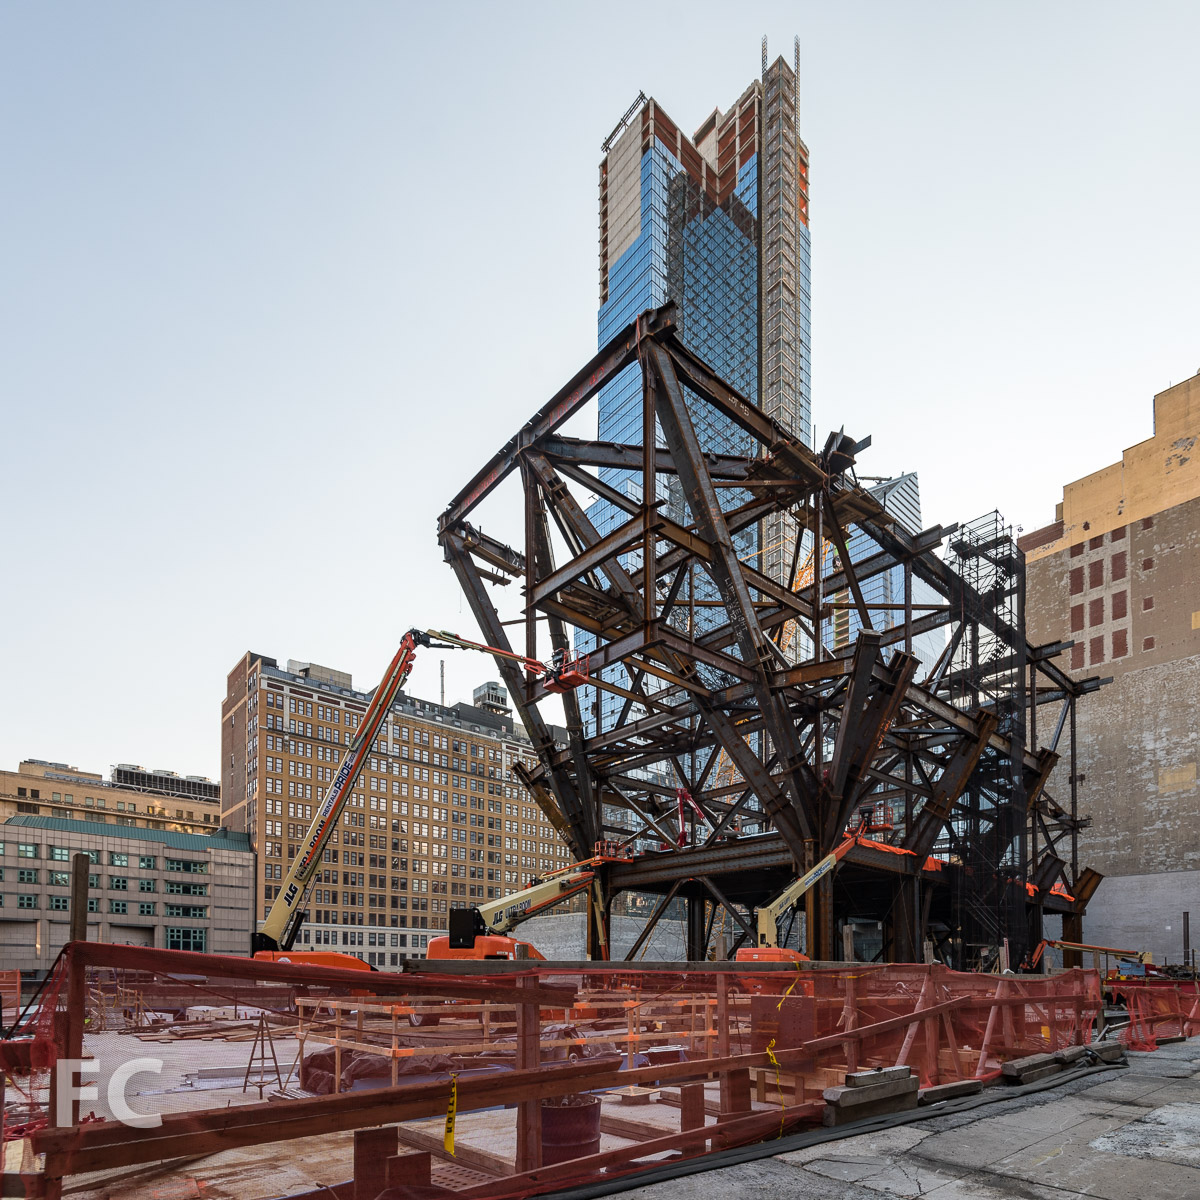 Northeast corner of the Manhattan West development with One Manhattan West rising in the foreground.